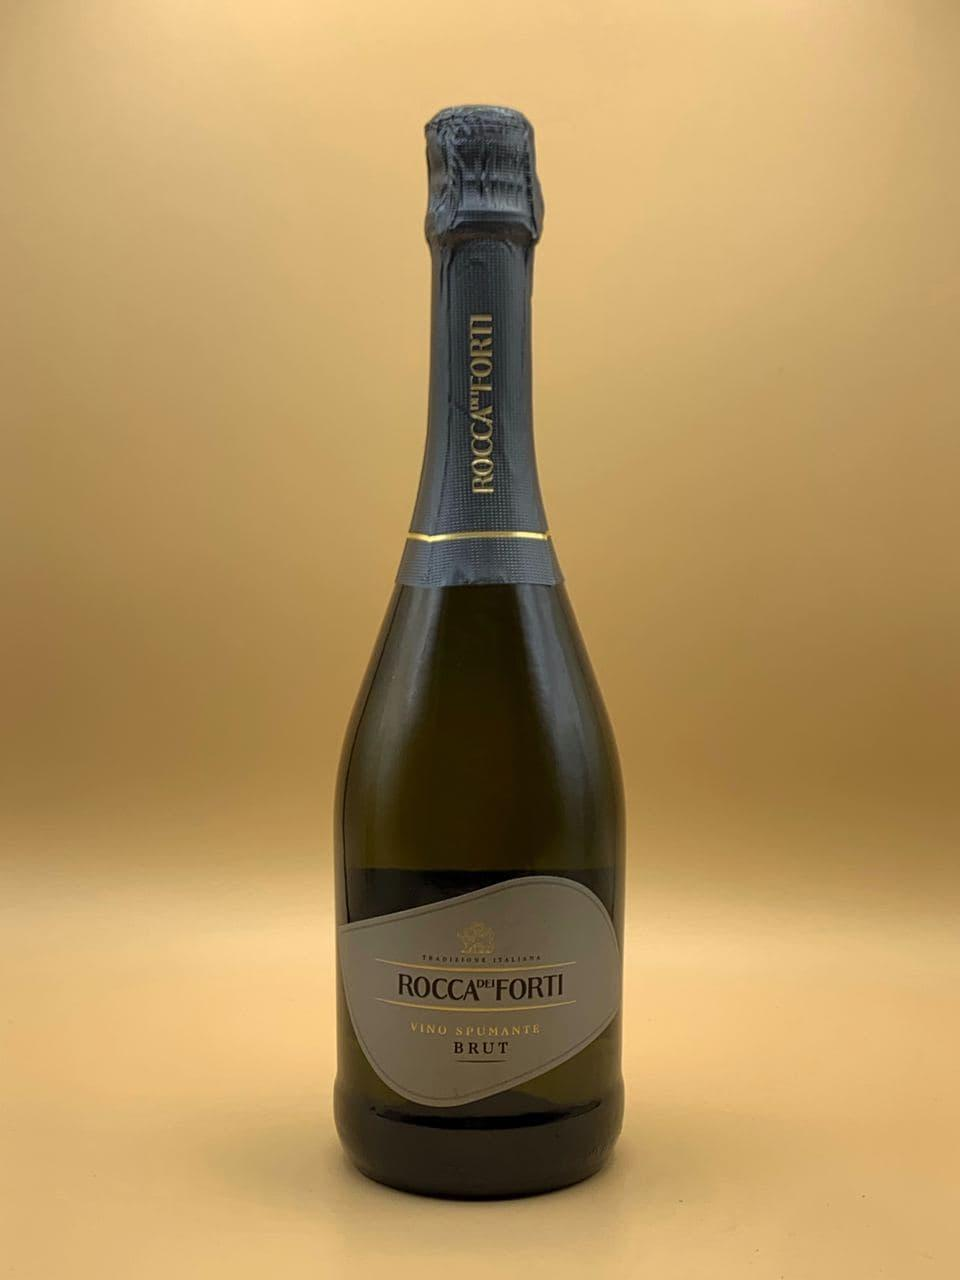 Игристое вино Rocca del Forti Brut 0.75L Рокка дей Форти Брют 0.75л